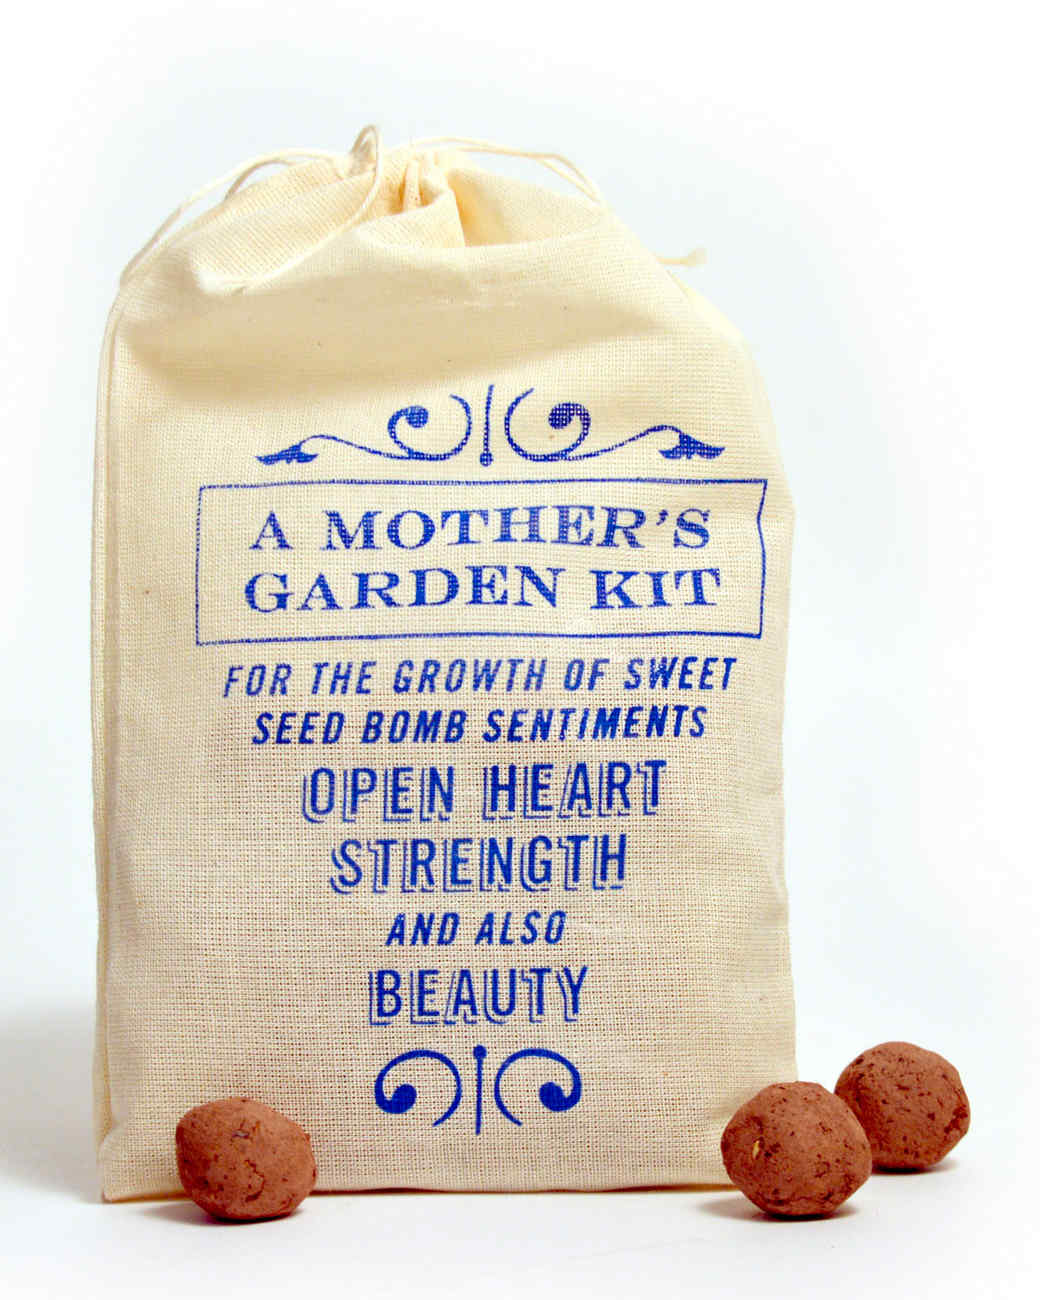 mothers-garden-kit-visualingual-0414.jpg